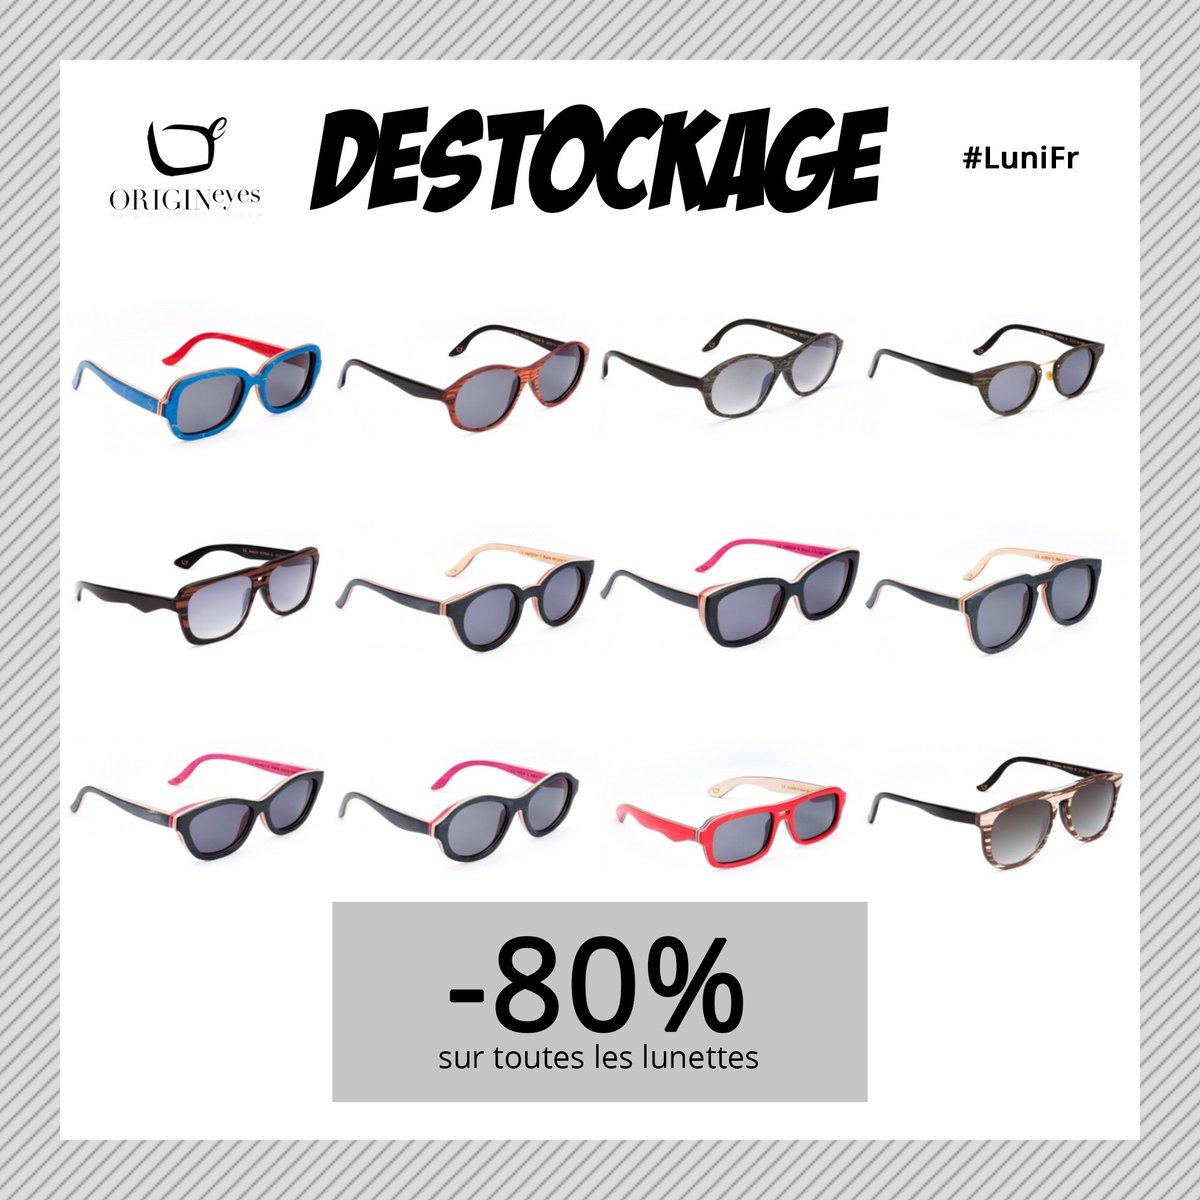 - 80% sur les produits OriginEyes jusqu'au 3 Avril 2017 !   http:// luni.fr/createurs/orig ineyes.html &nbsp; …  #soleil #lunettes #sun #lunifr #printemps #summer #luni<br>http://pic.twitter.com/yuUF7UHwbW